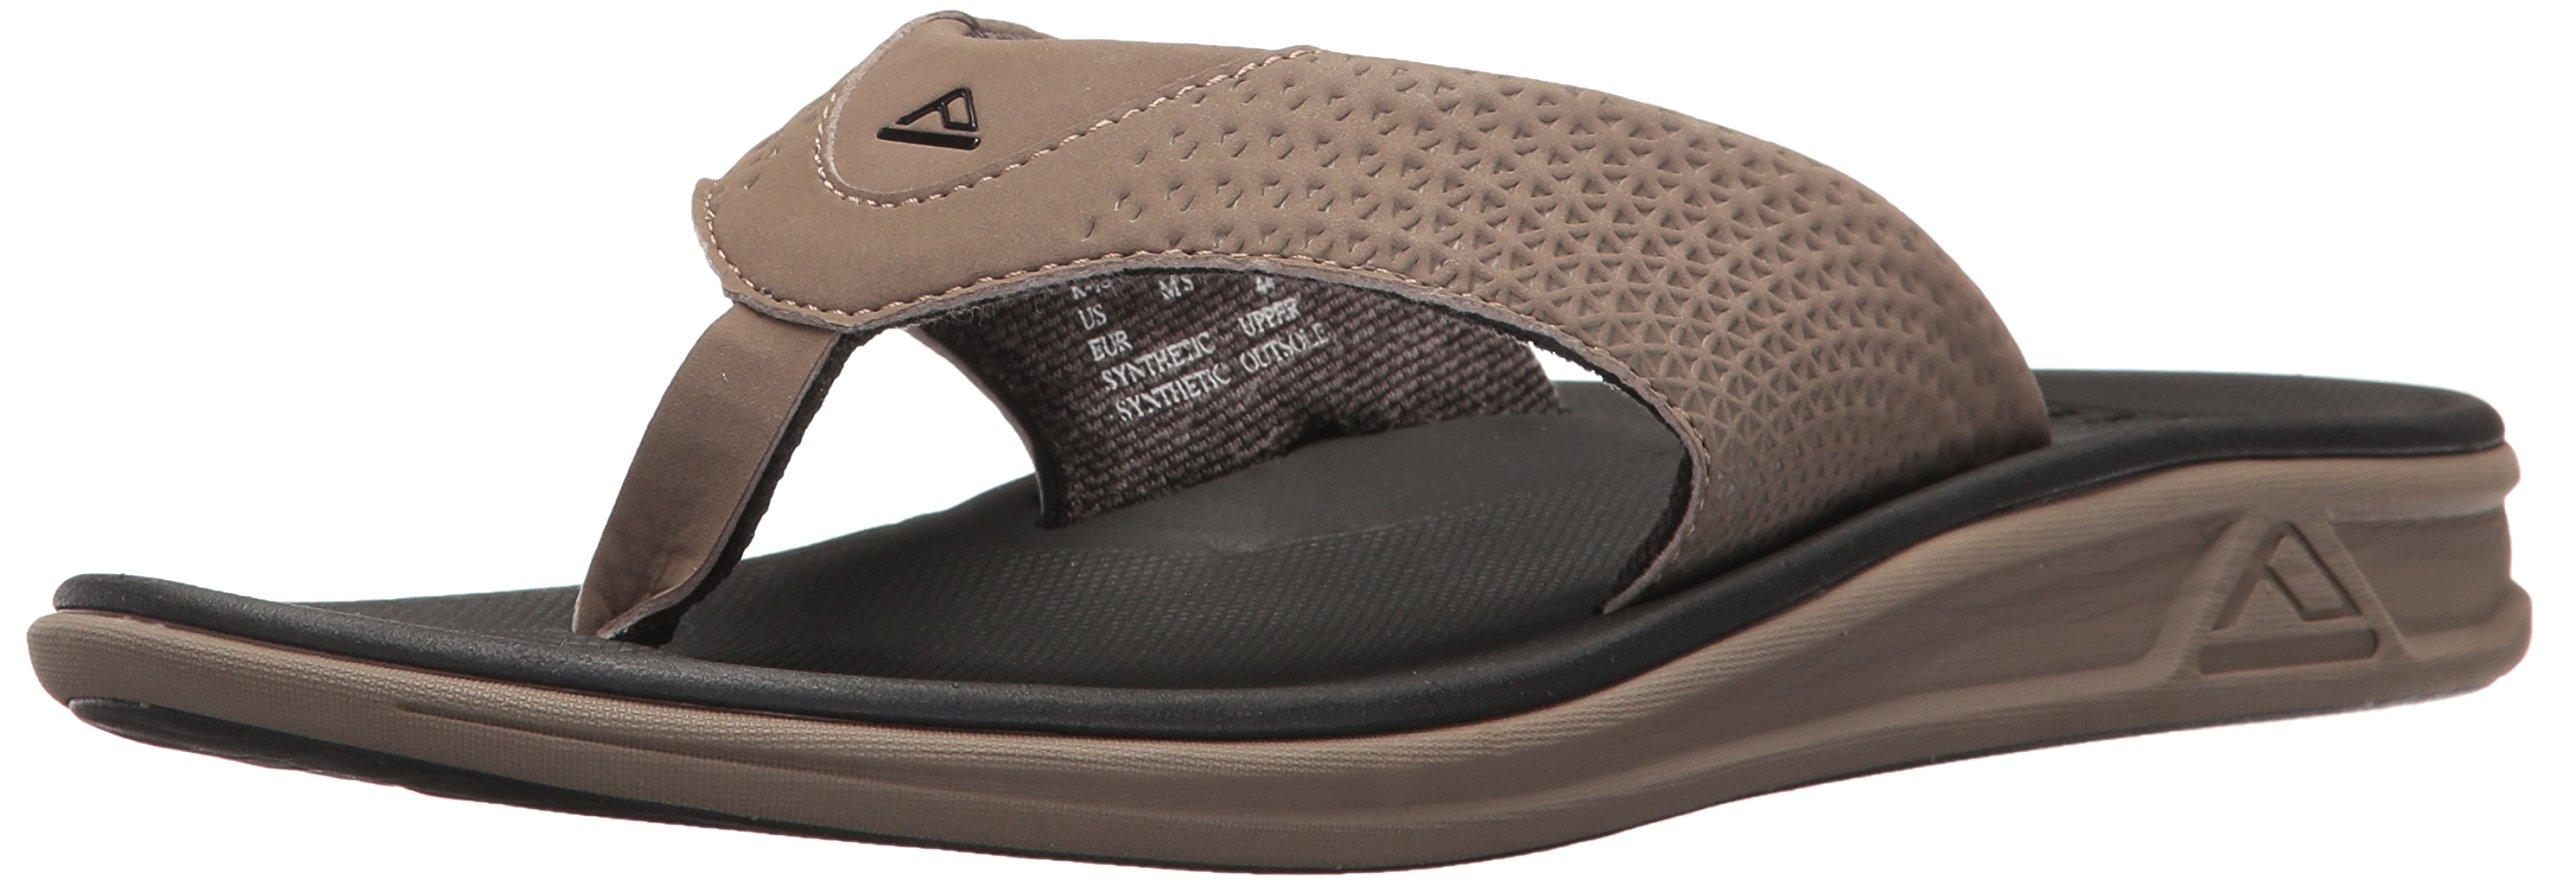 Reef Men's Rover Flip Flop, Tan/black, 15 M US